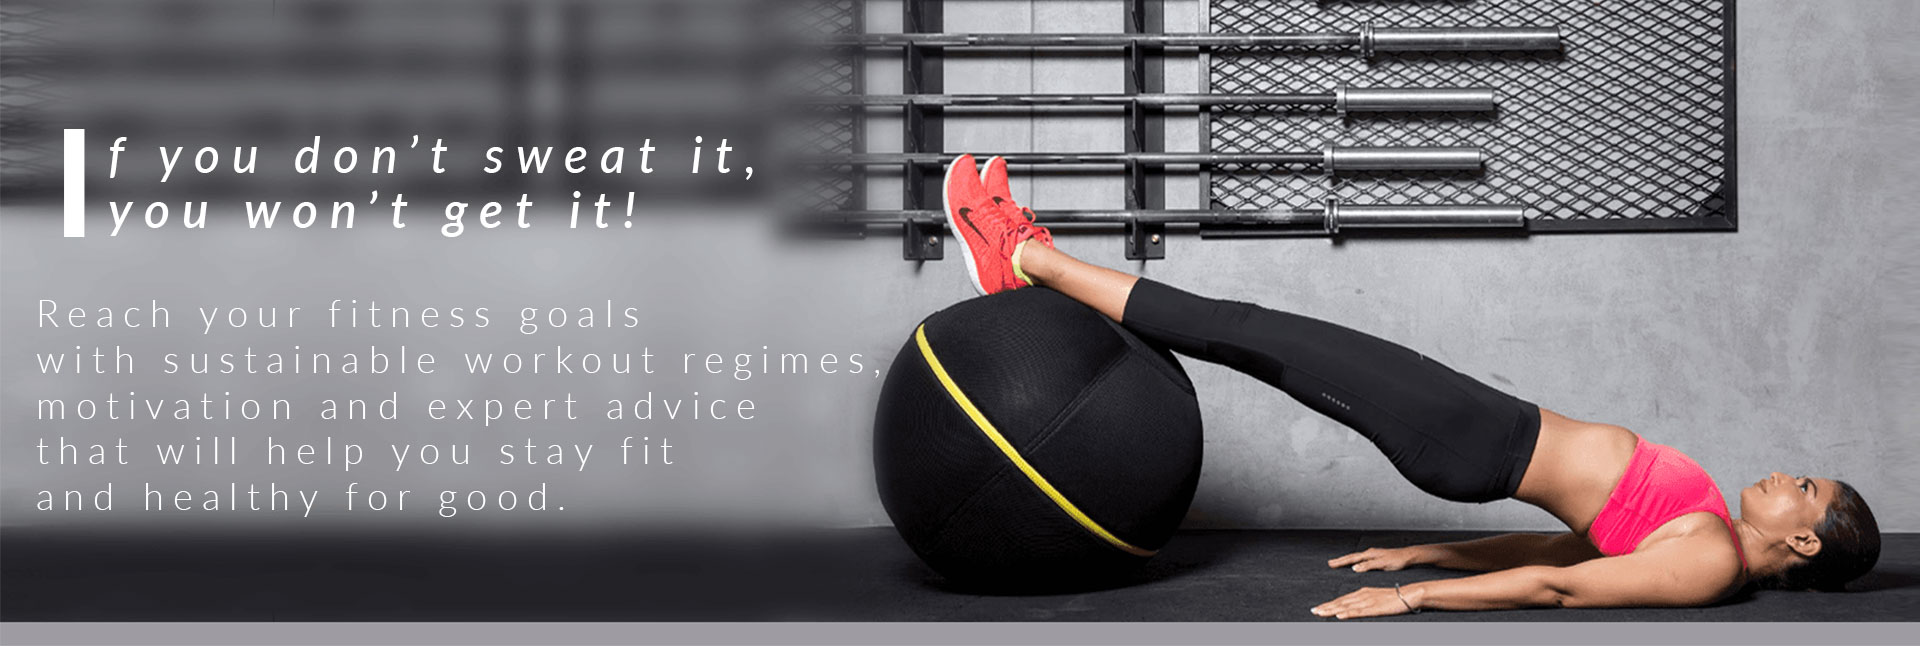 Tips To Overcome A Fitness Plateau